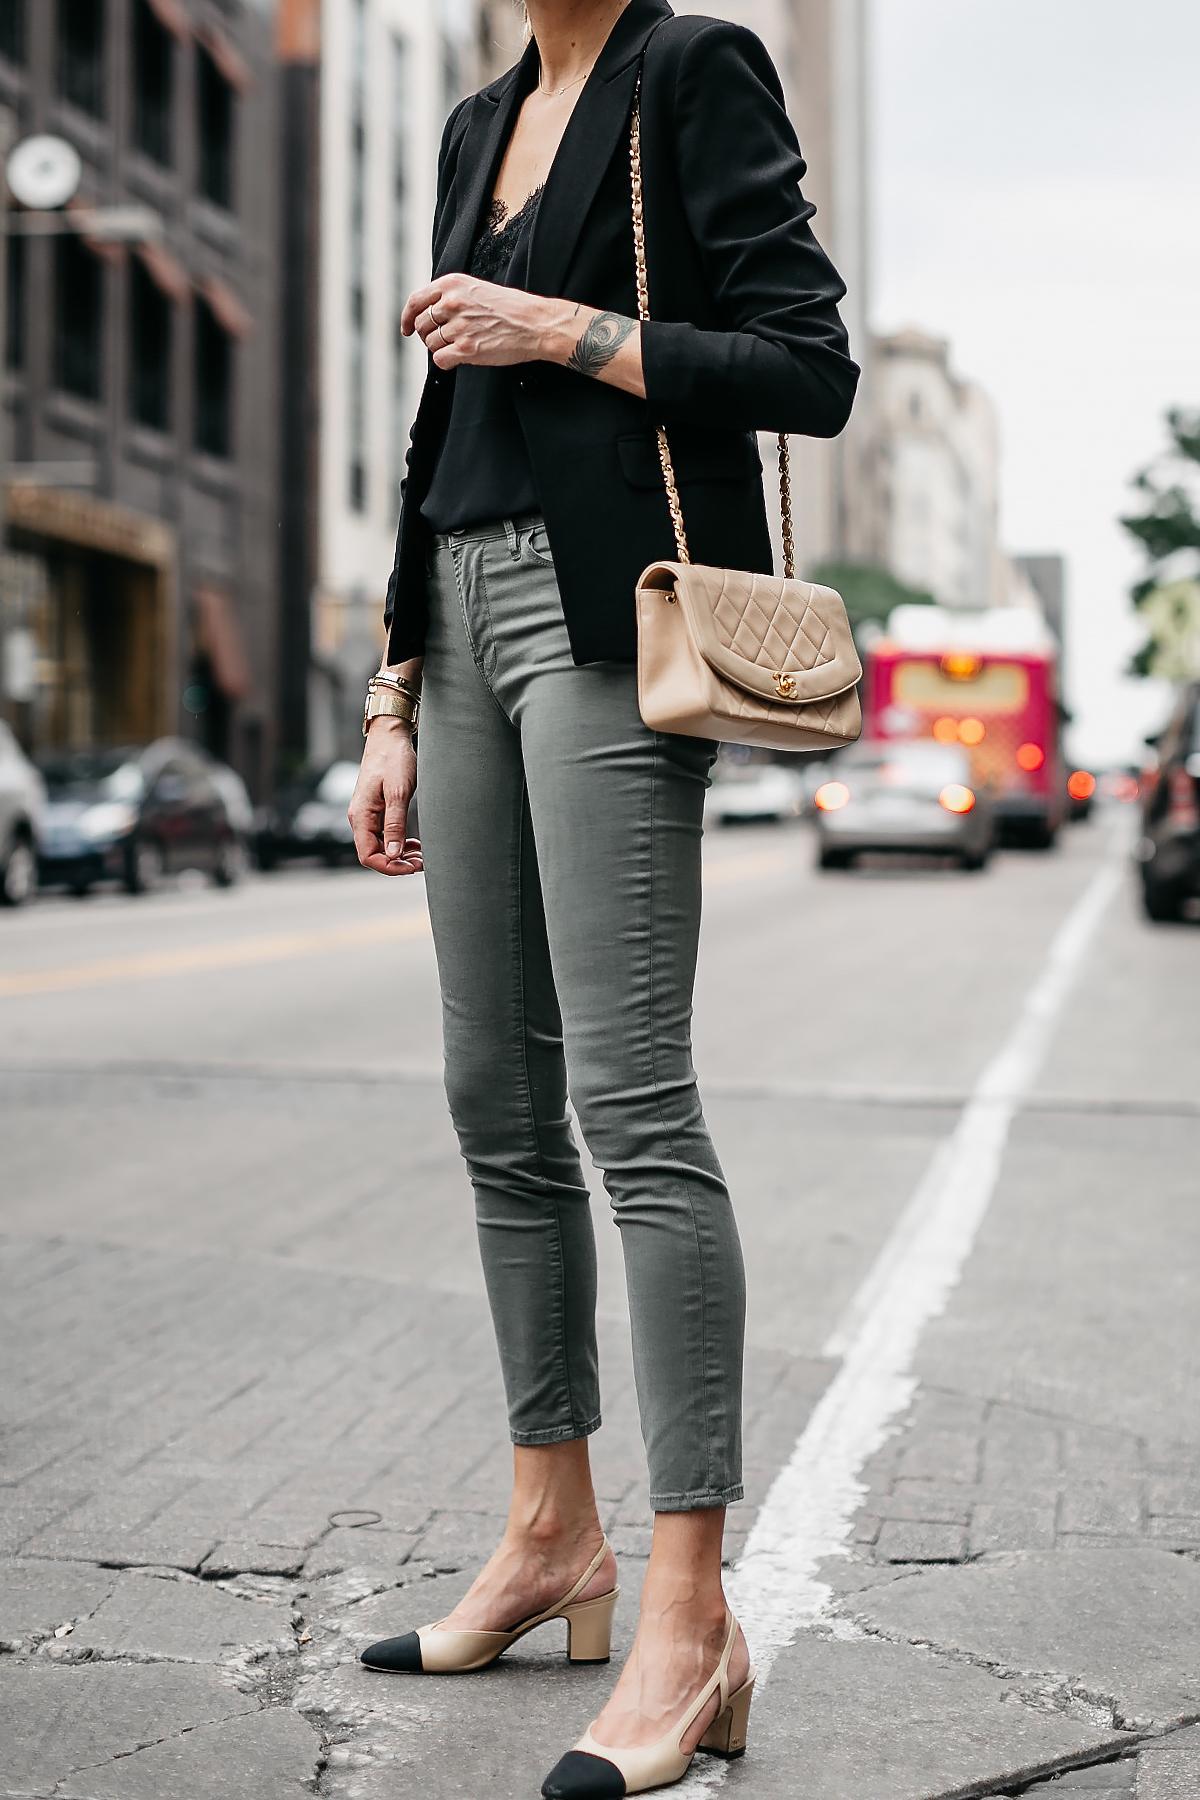 Woman Wearing Black Lace Cami Black Blazer Frame Olive Green Jeans Chanel Slingbacks Chanel Tan Handbag Fashion Jackson Dallas Blogger Fashion Blogger Street Style